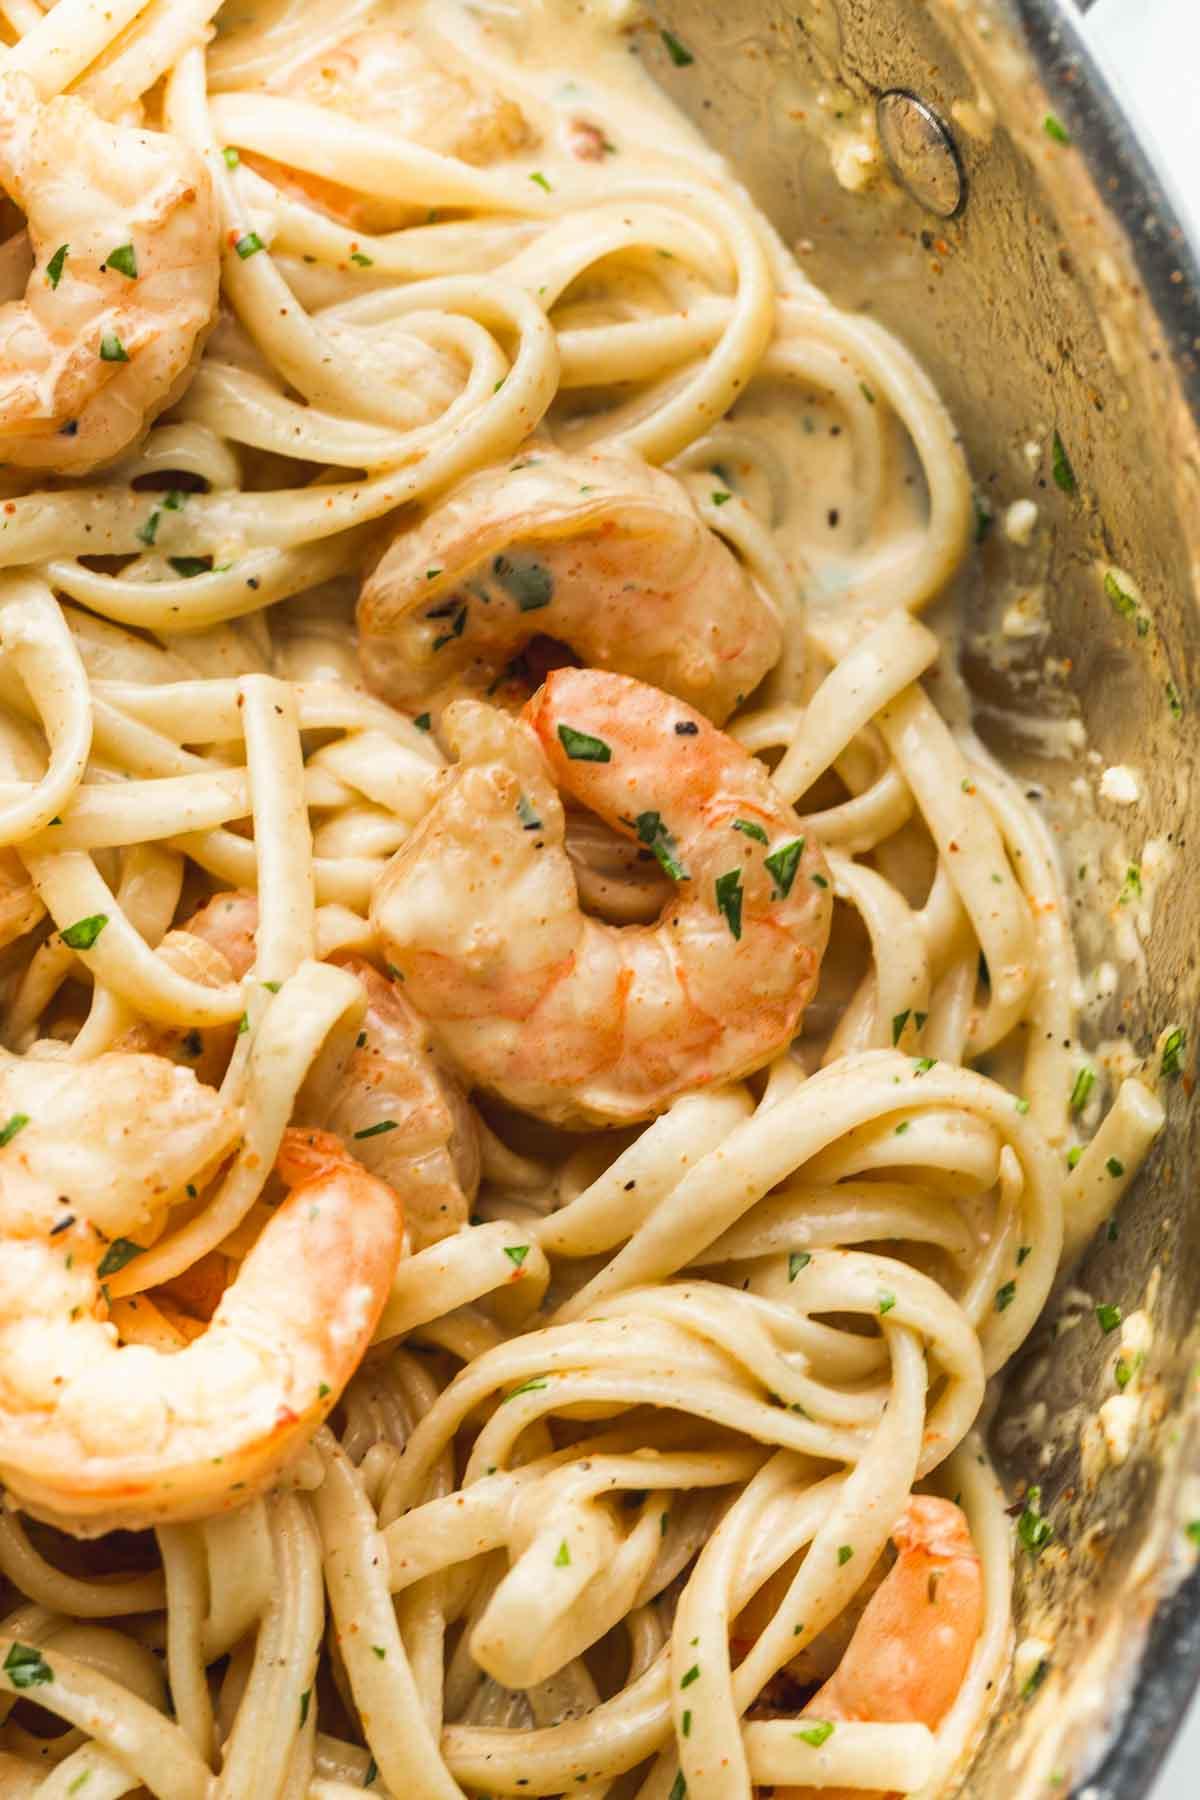 Close up of shrimps and creamy linguine pasta